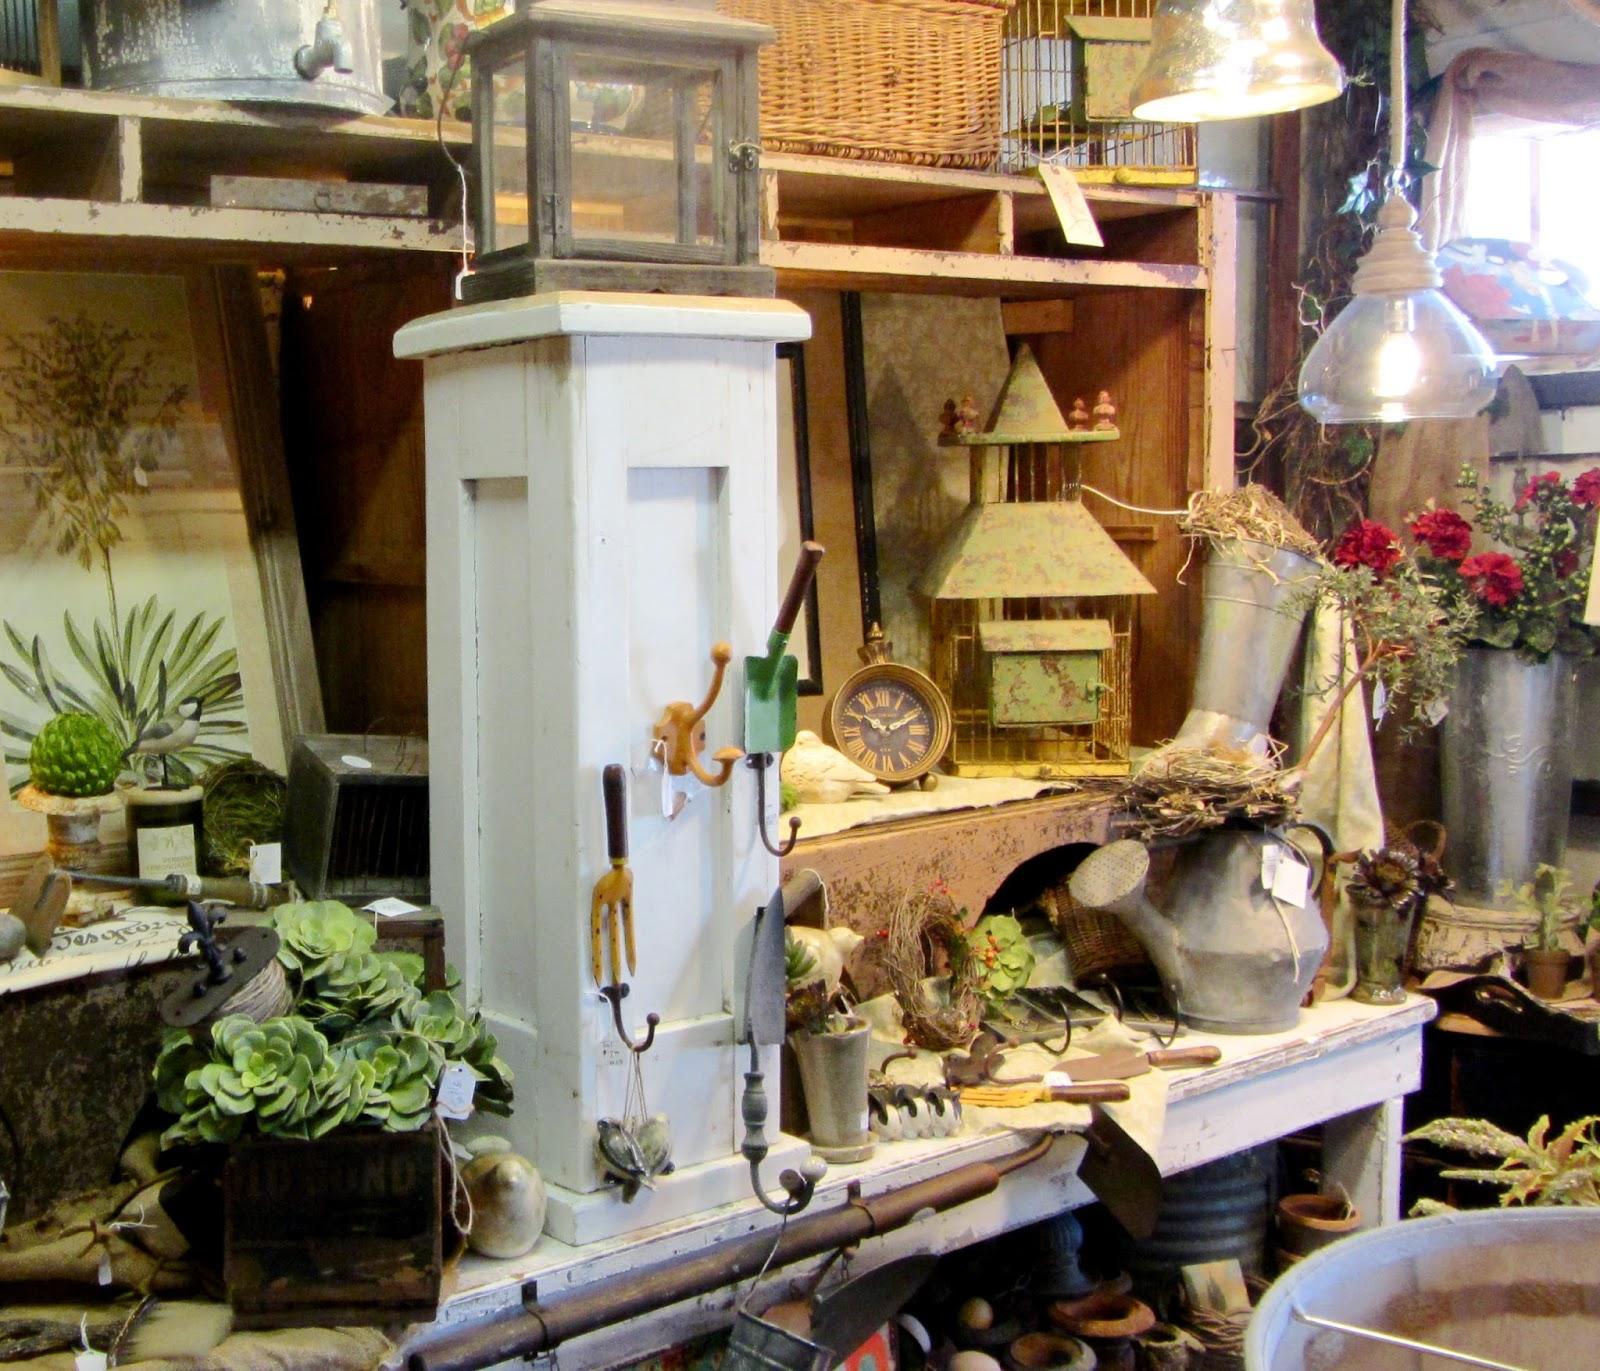 Robins Vintage Suitcase: Vintage Garden Room